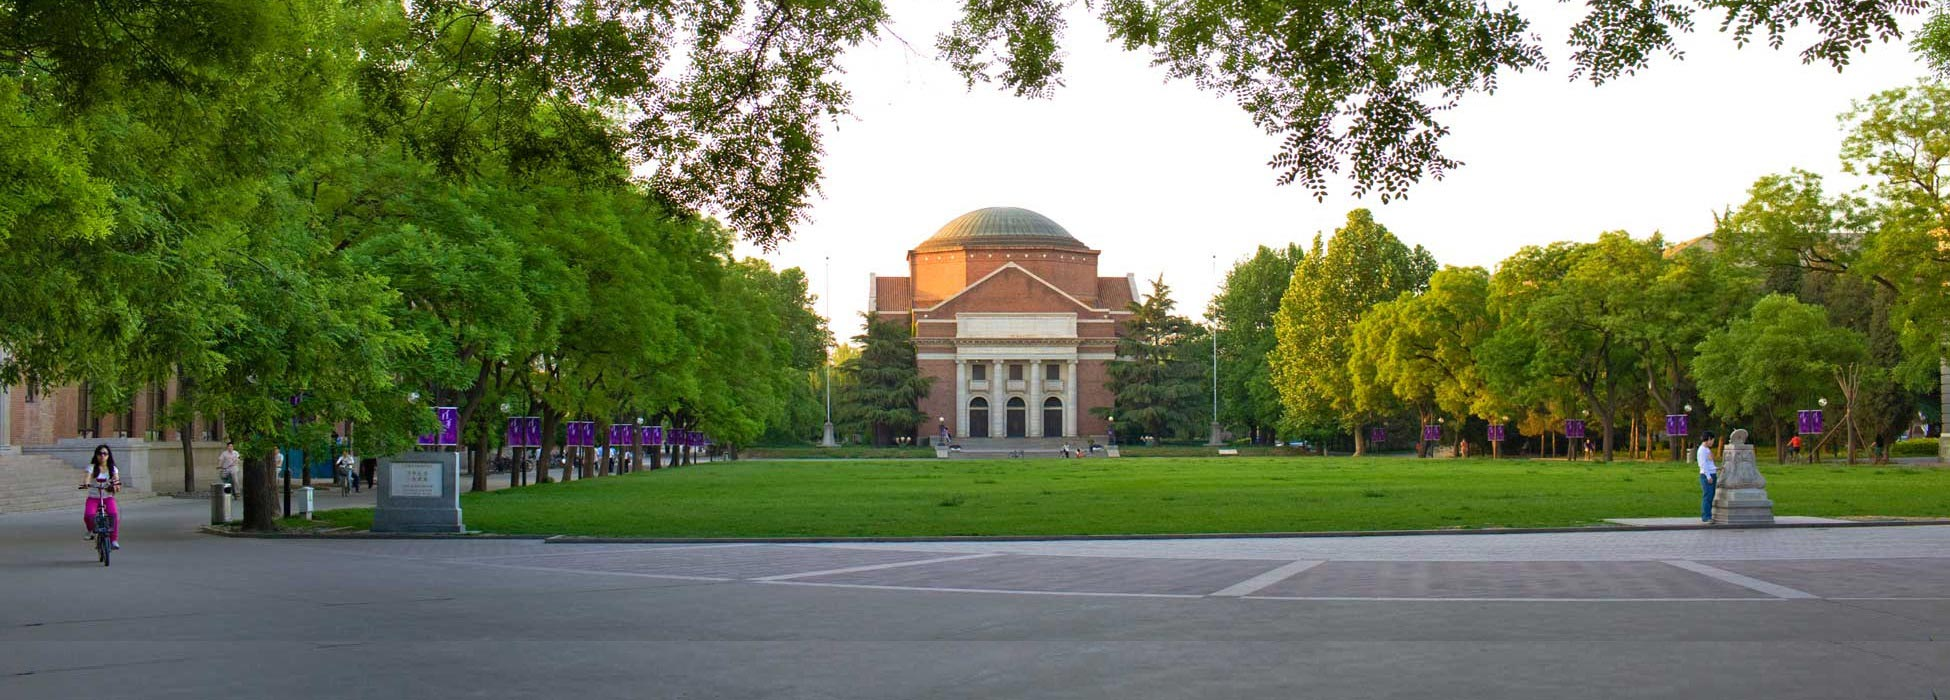 Класация Times Higher Education 2021